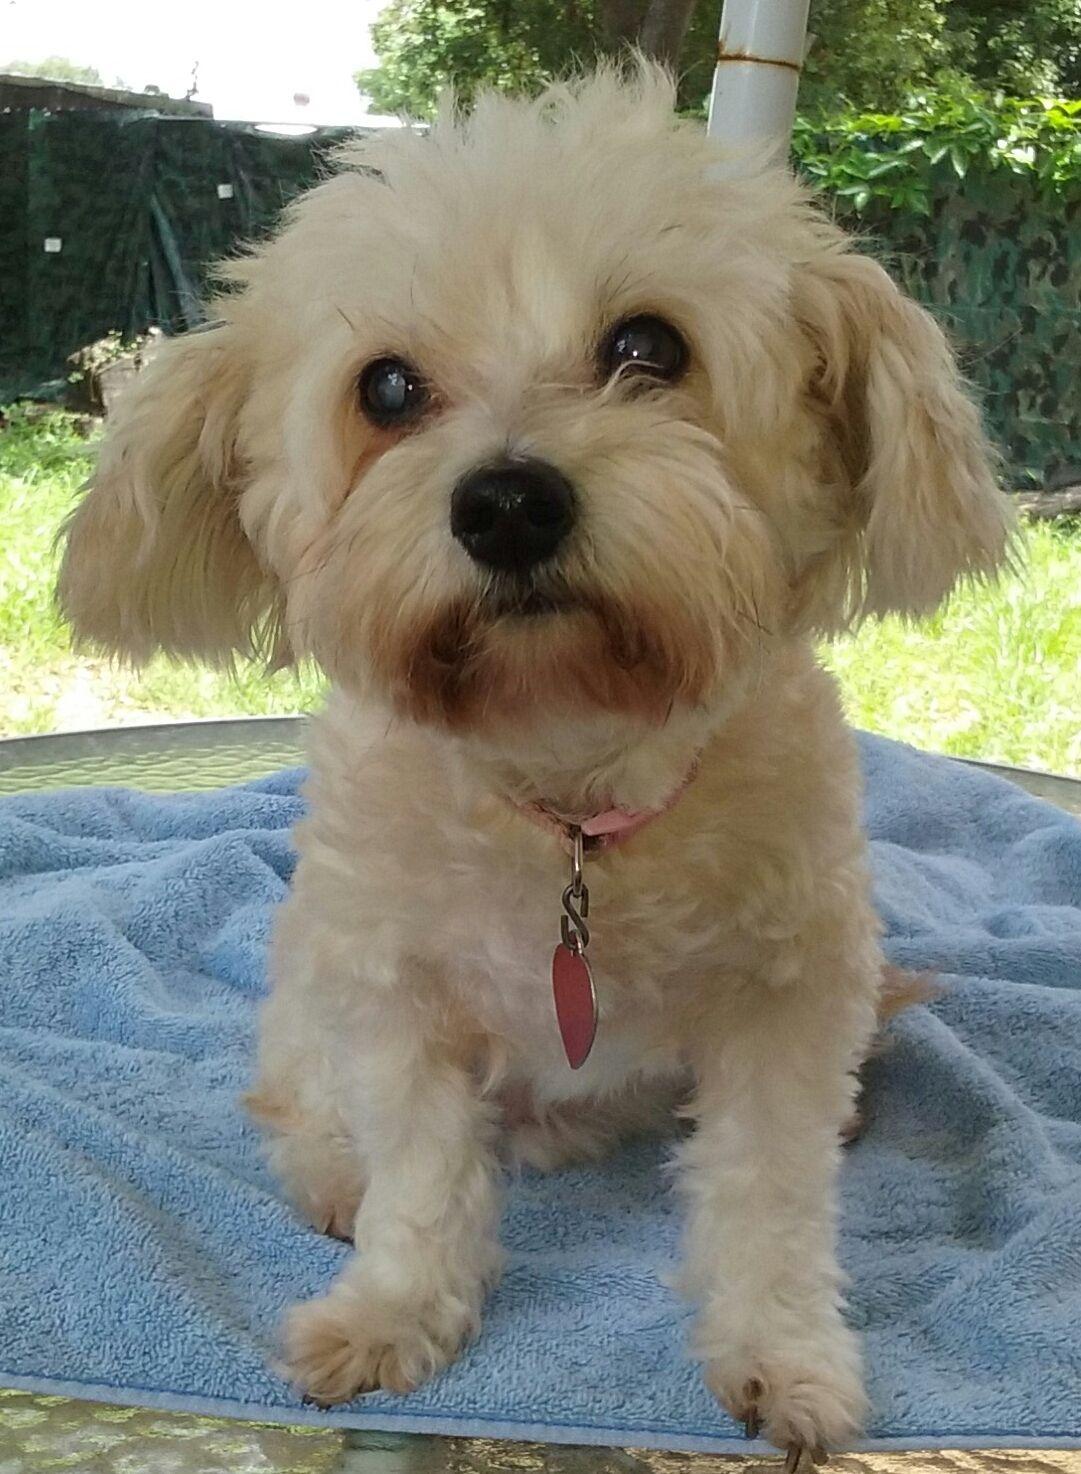 Adopt DaisyAnn (FL) on Barboncino